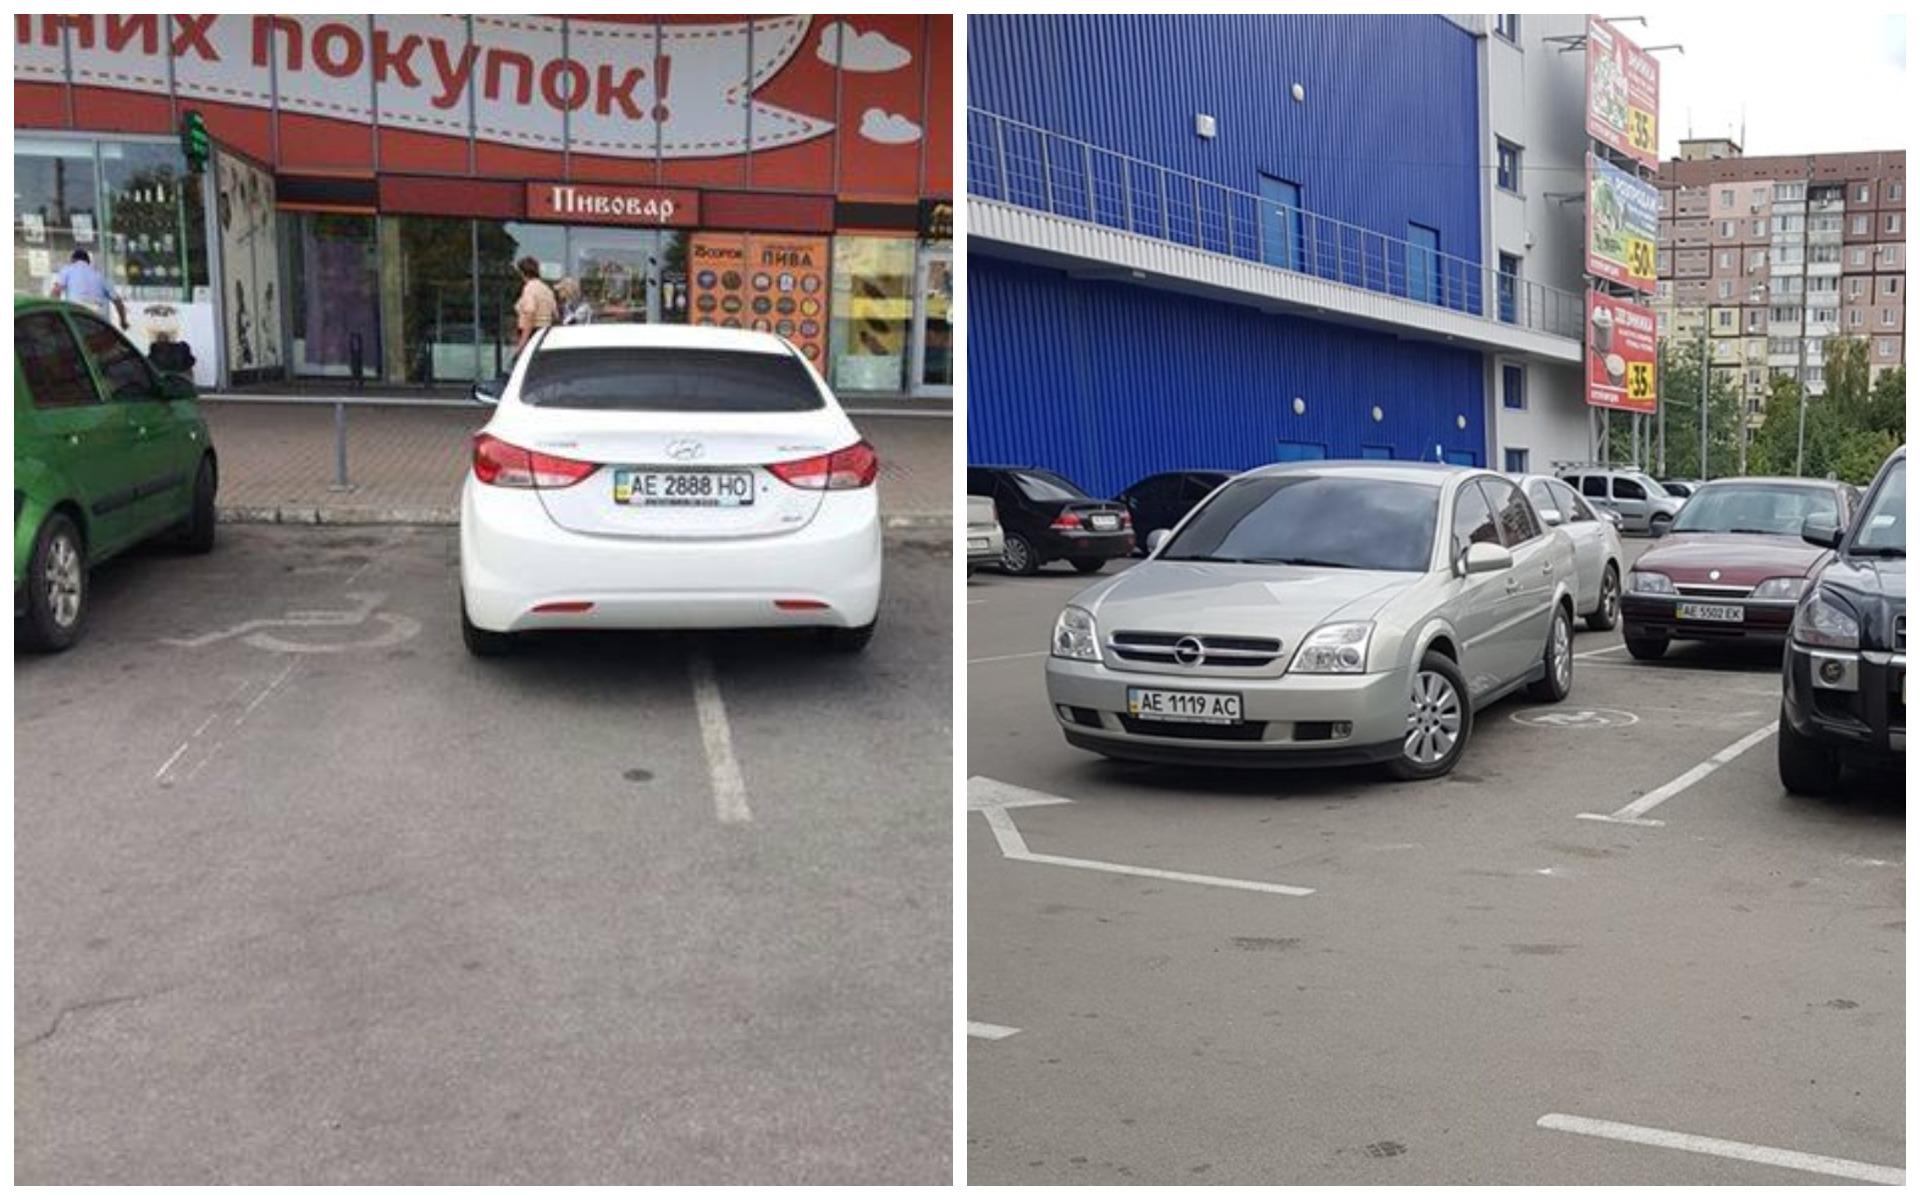 Hyundai Elantra с номером АЕ 2888 НО и Opel Vectra с номером АЕ 1119 АС